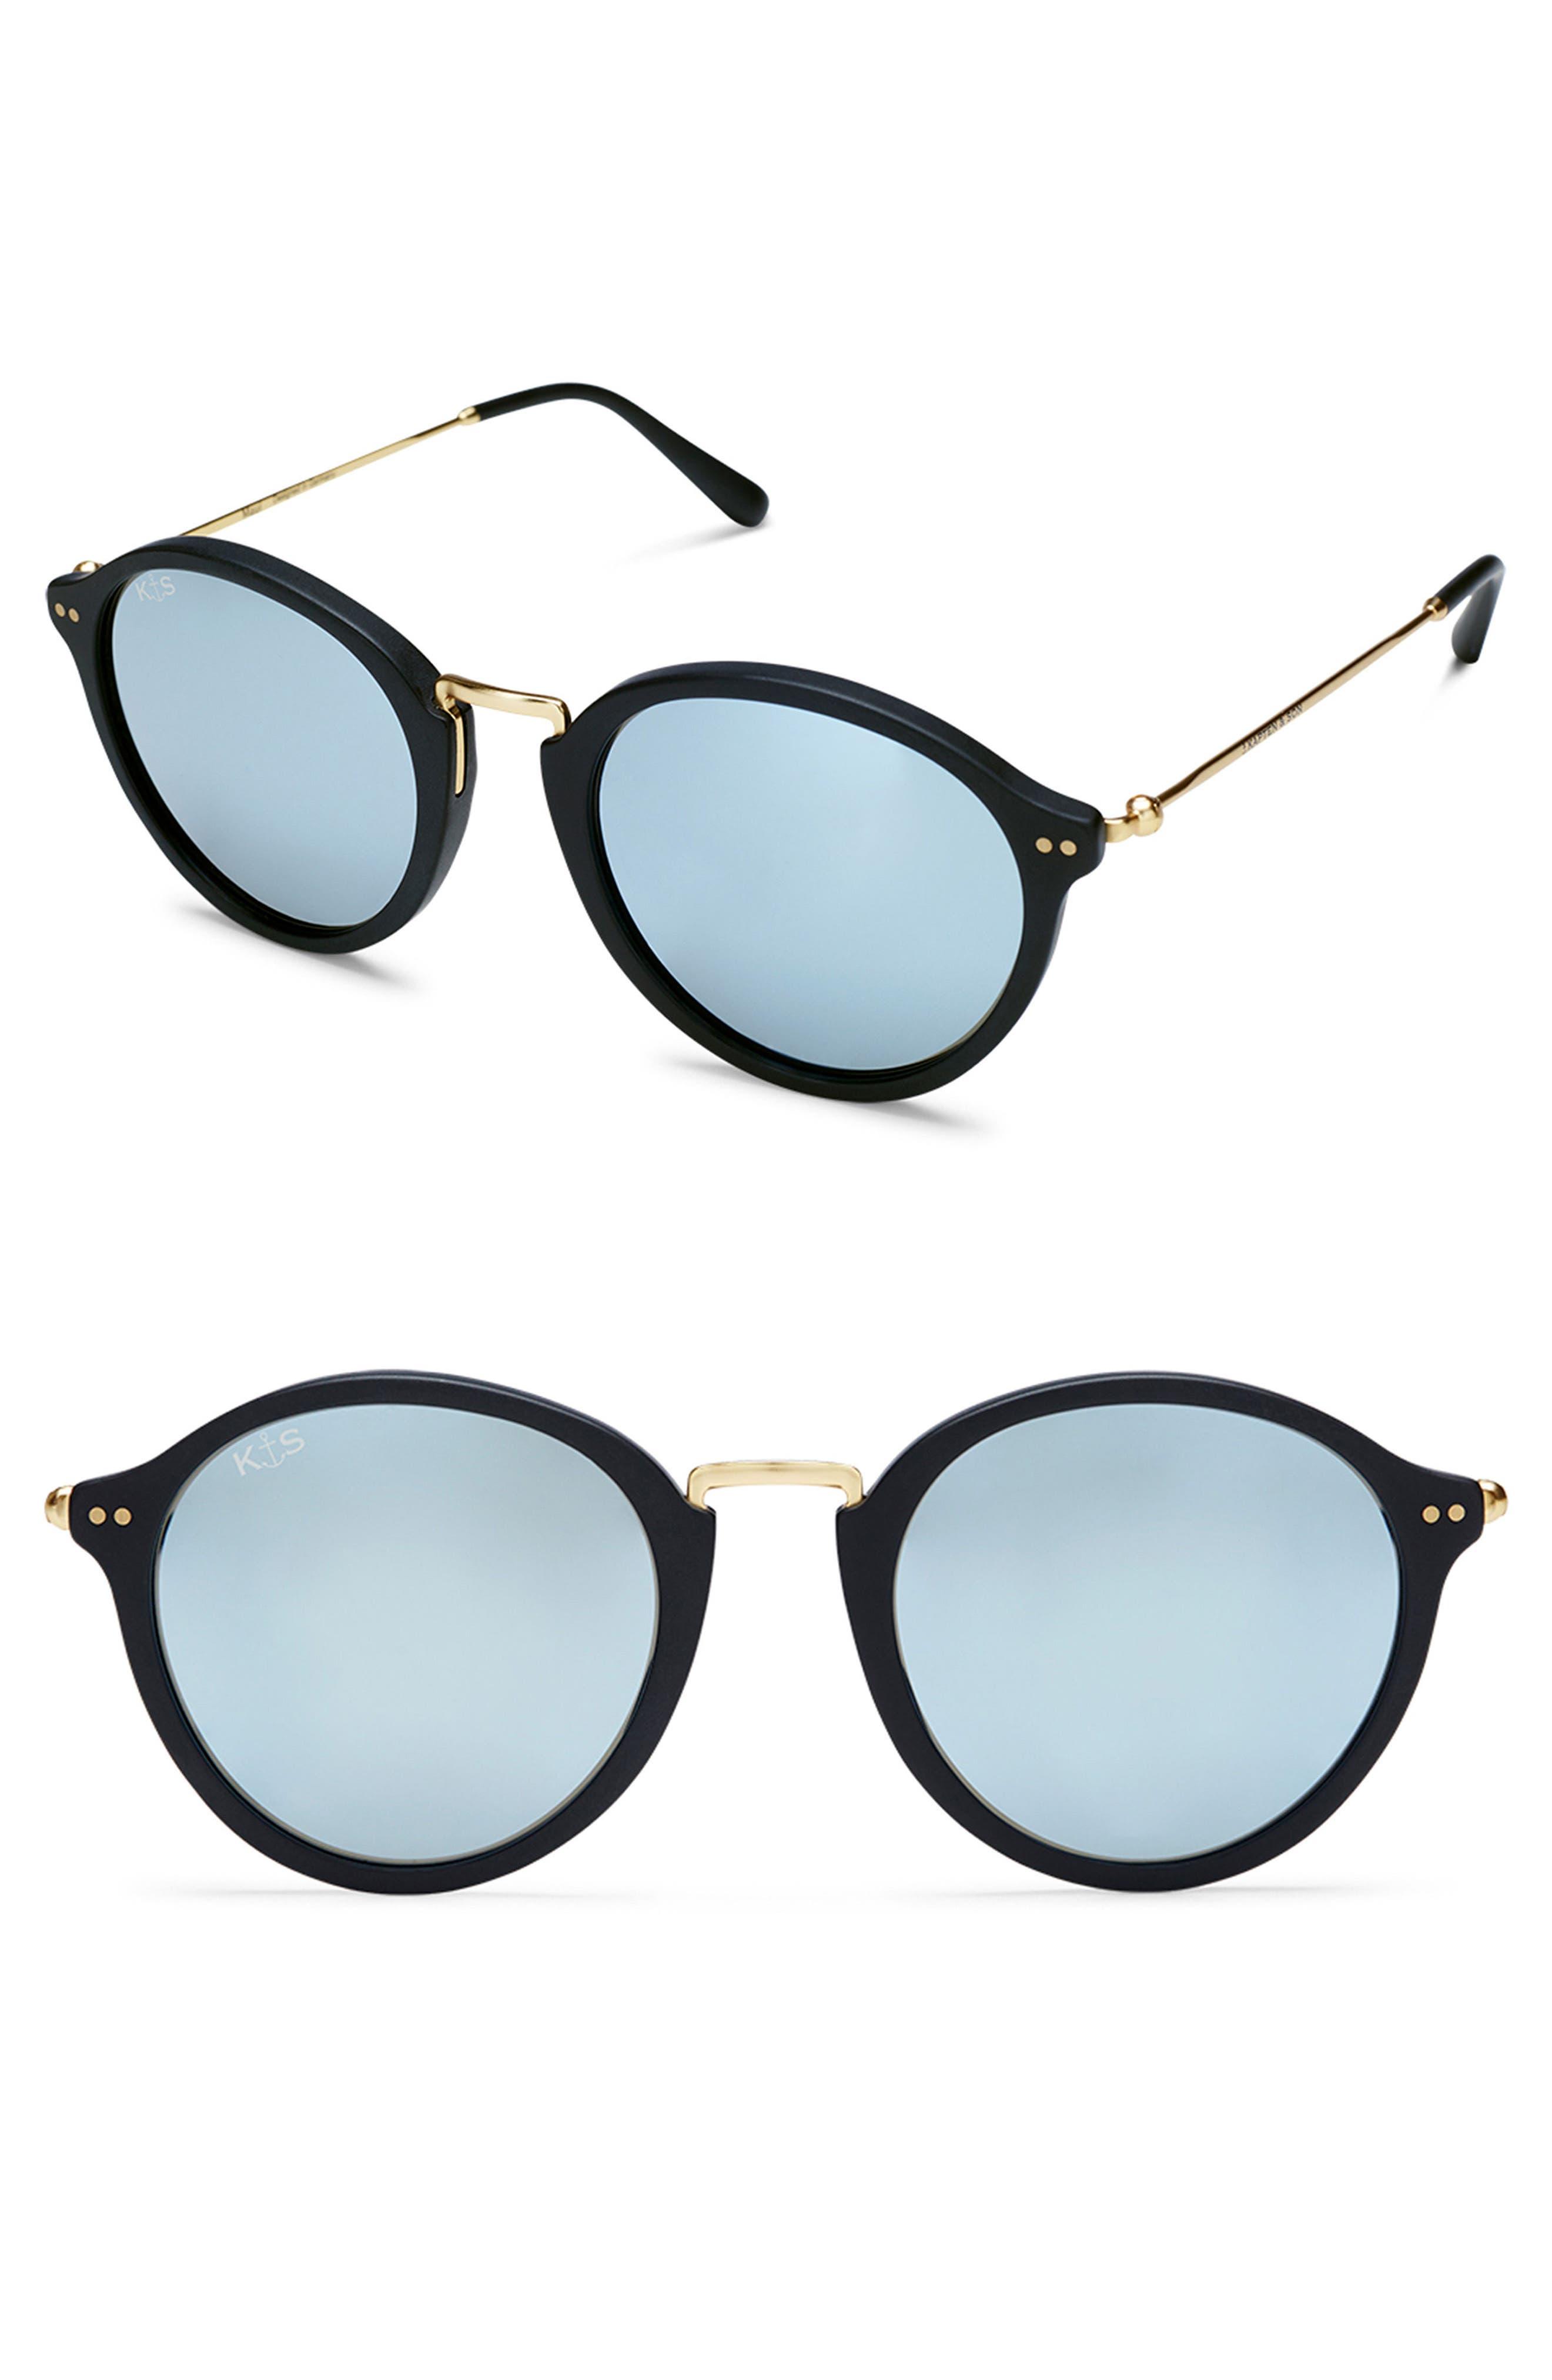 Maui 48mm Sunglasses,                         Main,                         color, Black/ Blue